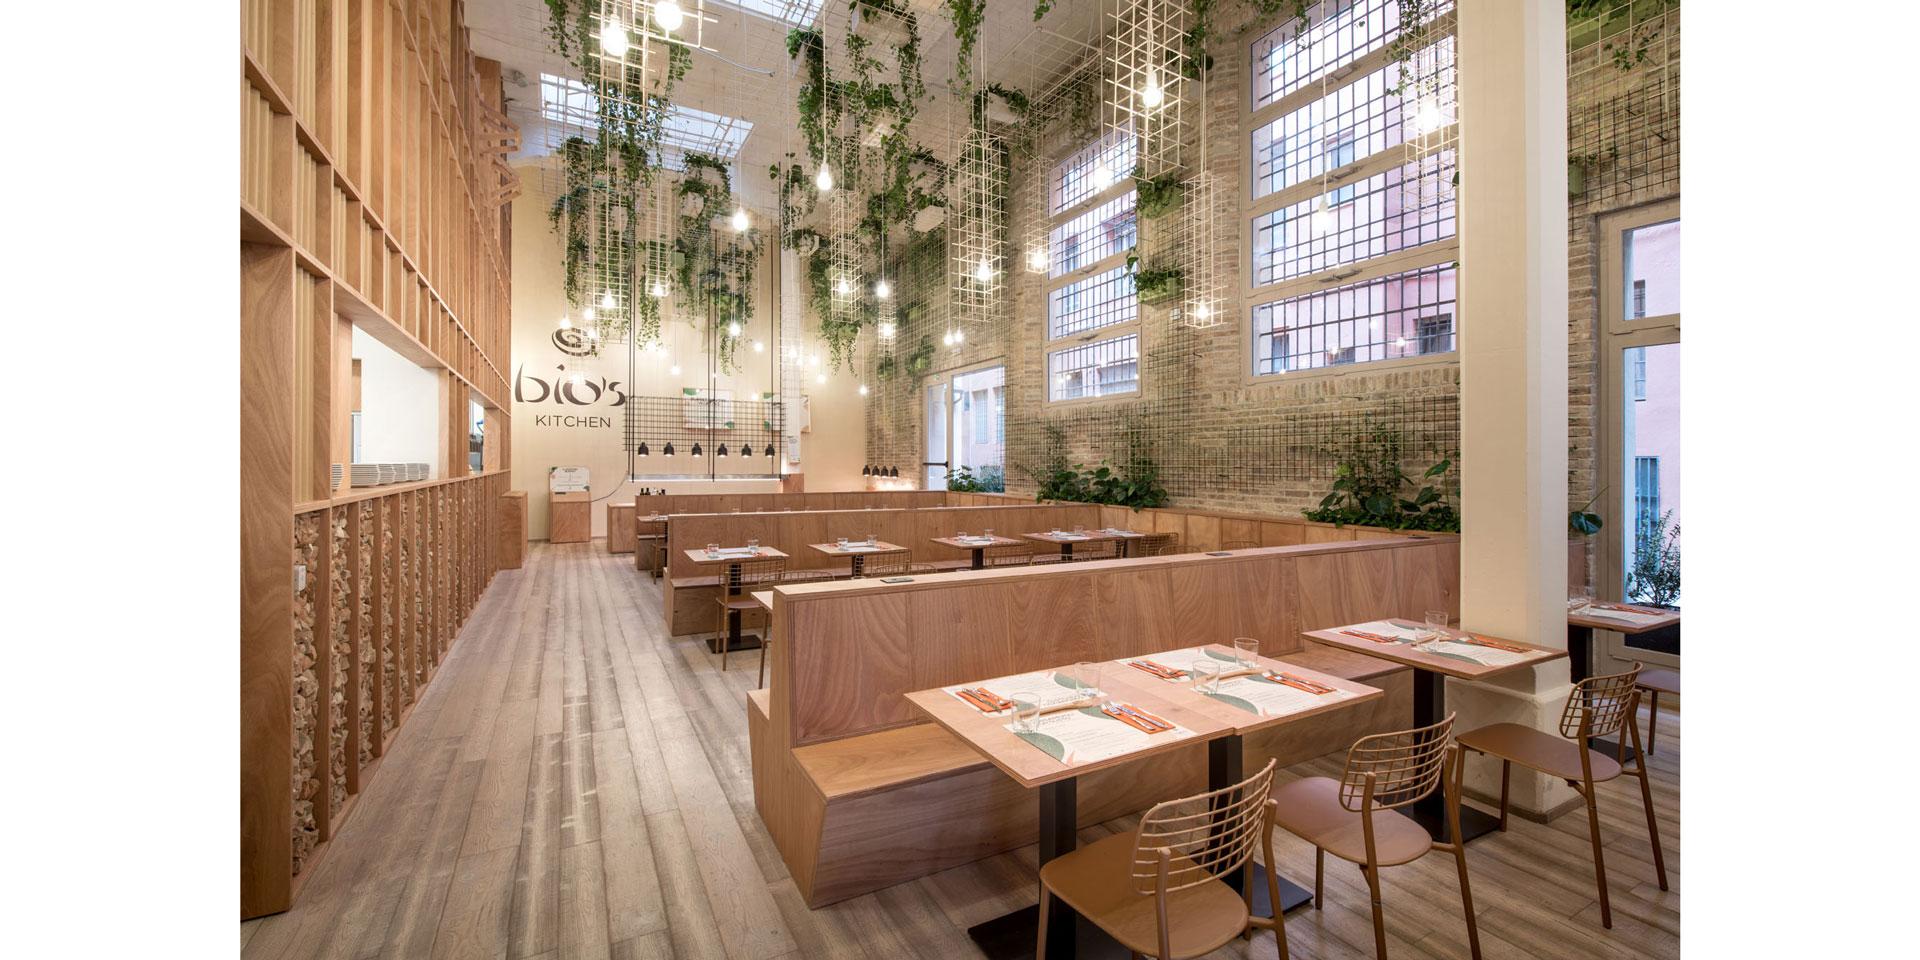 archinow_BOB_new-restaurant_06